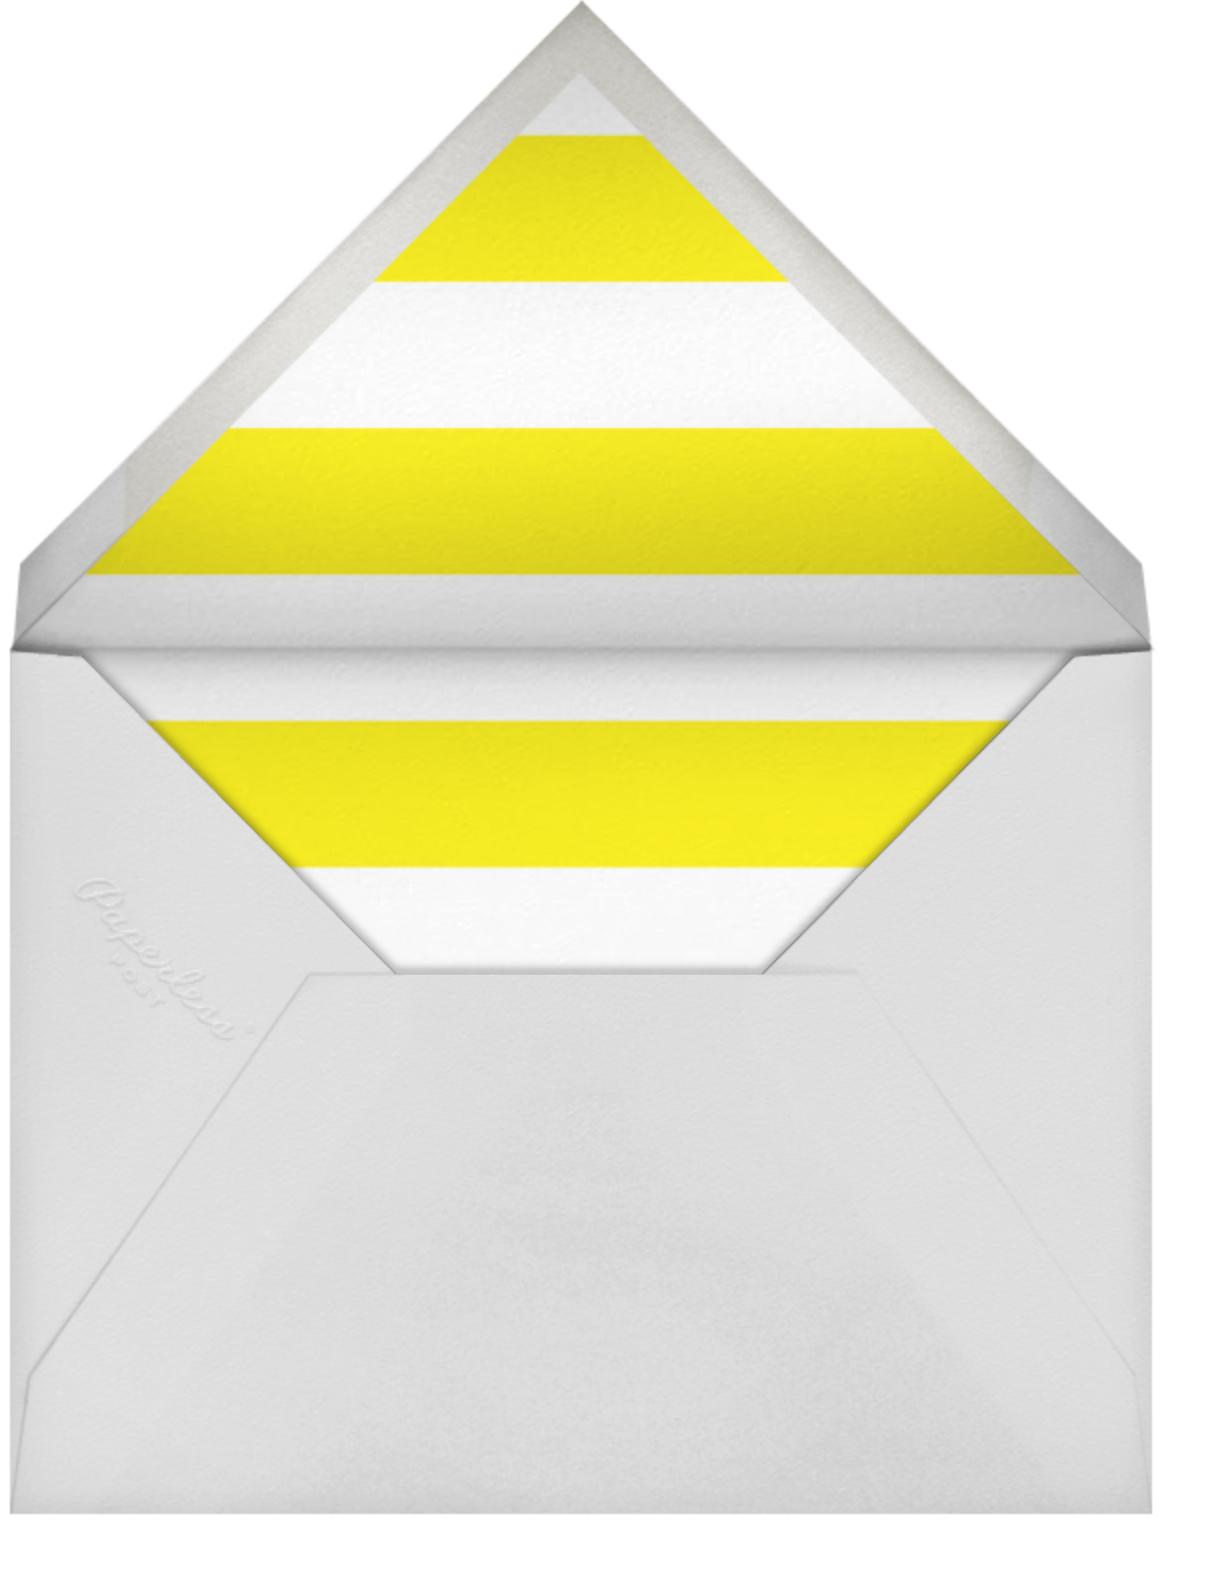 Yellow Poppies - kate spade new york - Adult birthday - envelope back